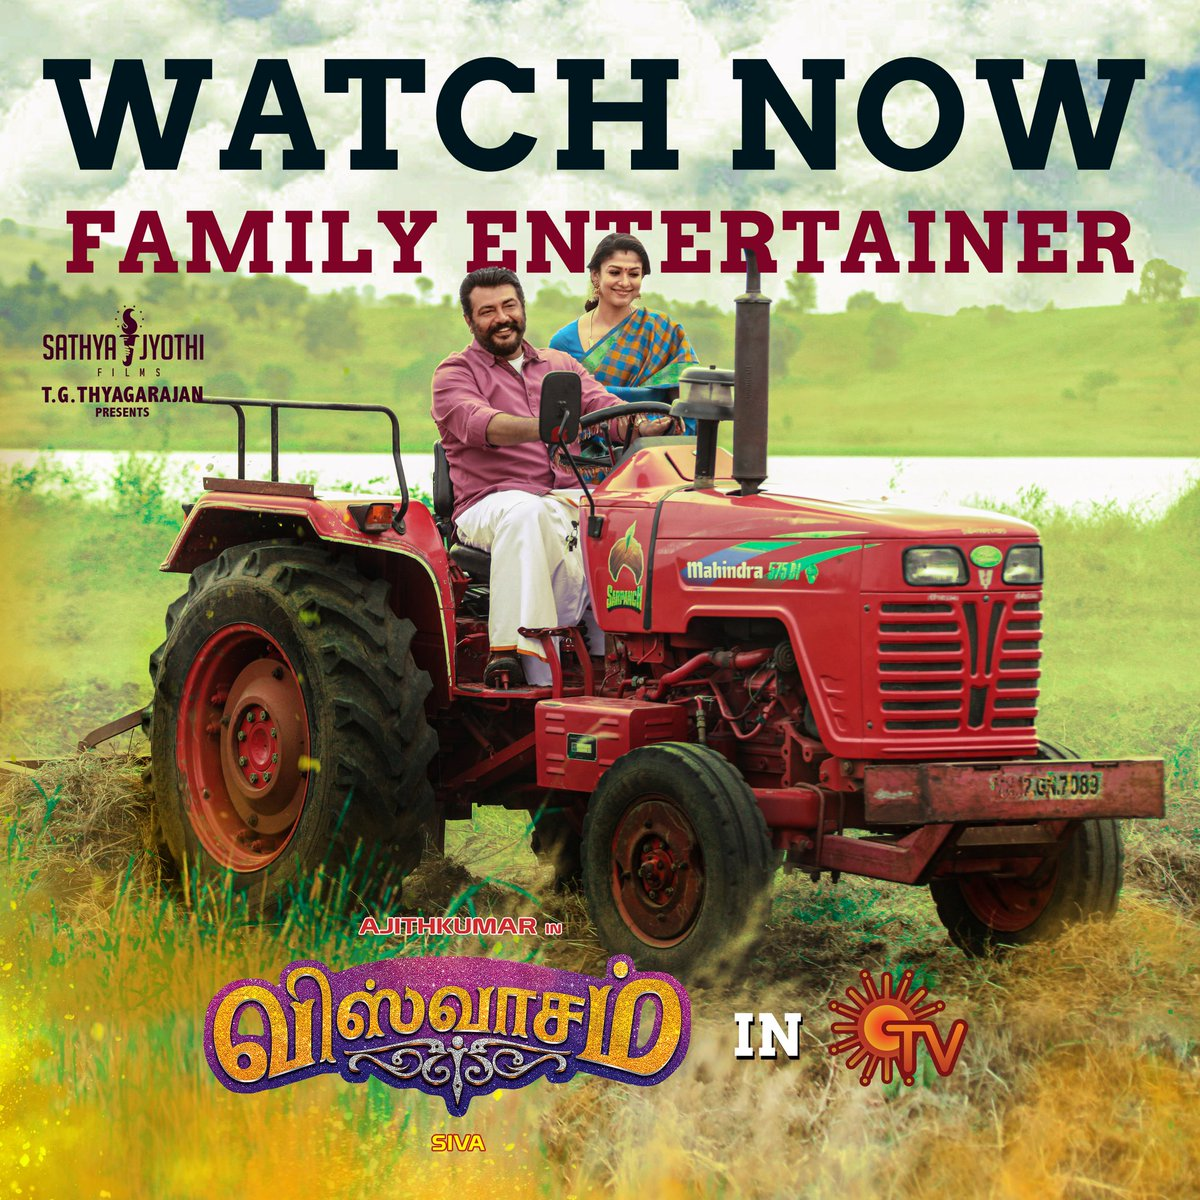 Watch Mega Family Entertainer 'Viswasam' now on @SunTV   #ViswasamOnSunTV  #AjithKumar #Nayanthara @directorsiva @SureshChandraa @IamJagguBhai @immancomposer @vetrivisuals @AntonyLRuben @dhilipaction @DoneChannel1